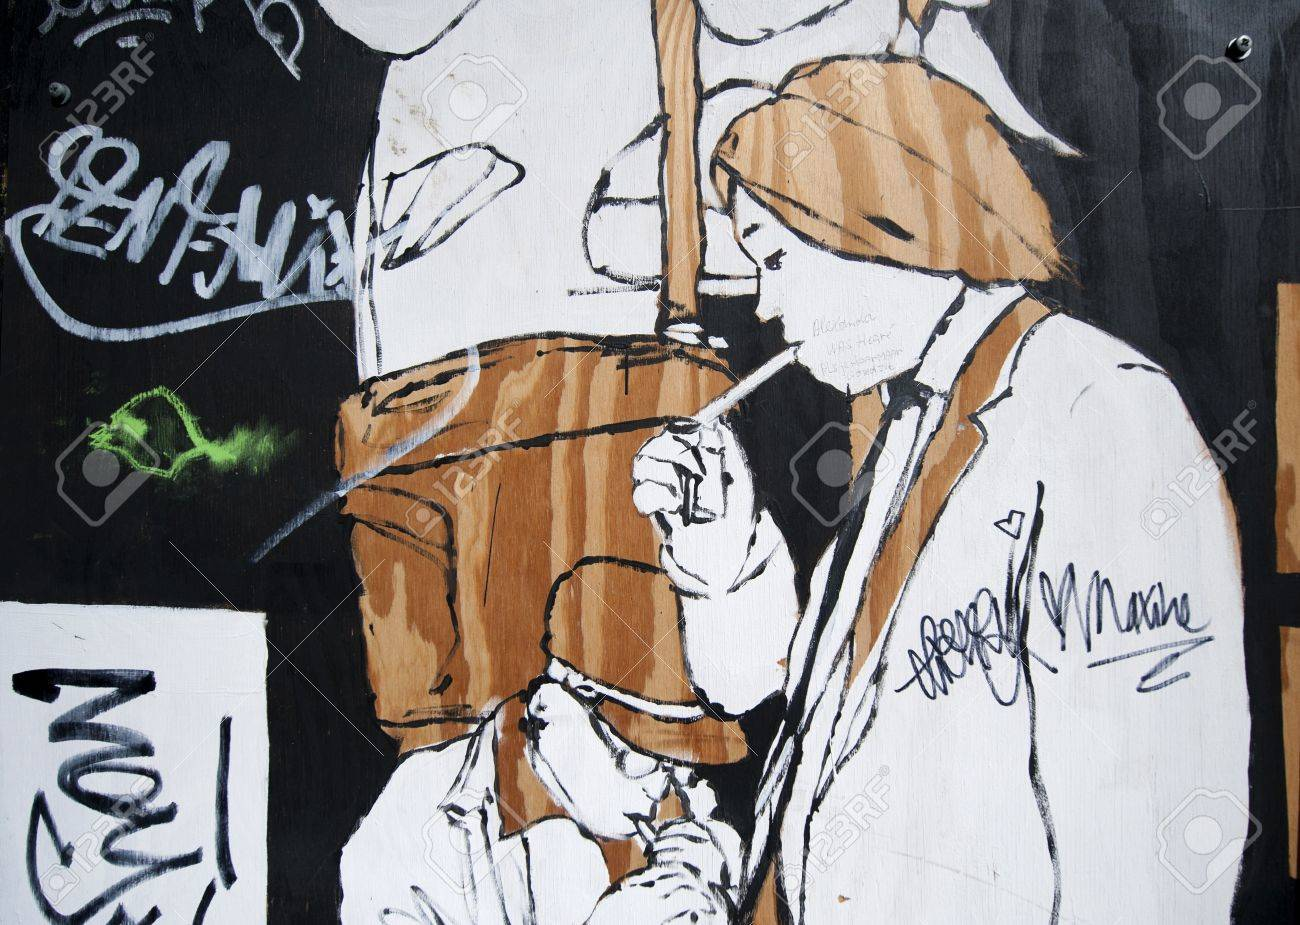 Graffiti art on wood - Detail Of Graffiti Street Art On Wood Boards In Public Domain Of Stylised Men Lighting Cigarettes